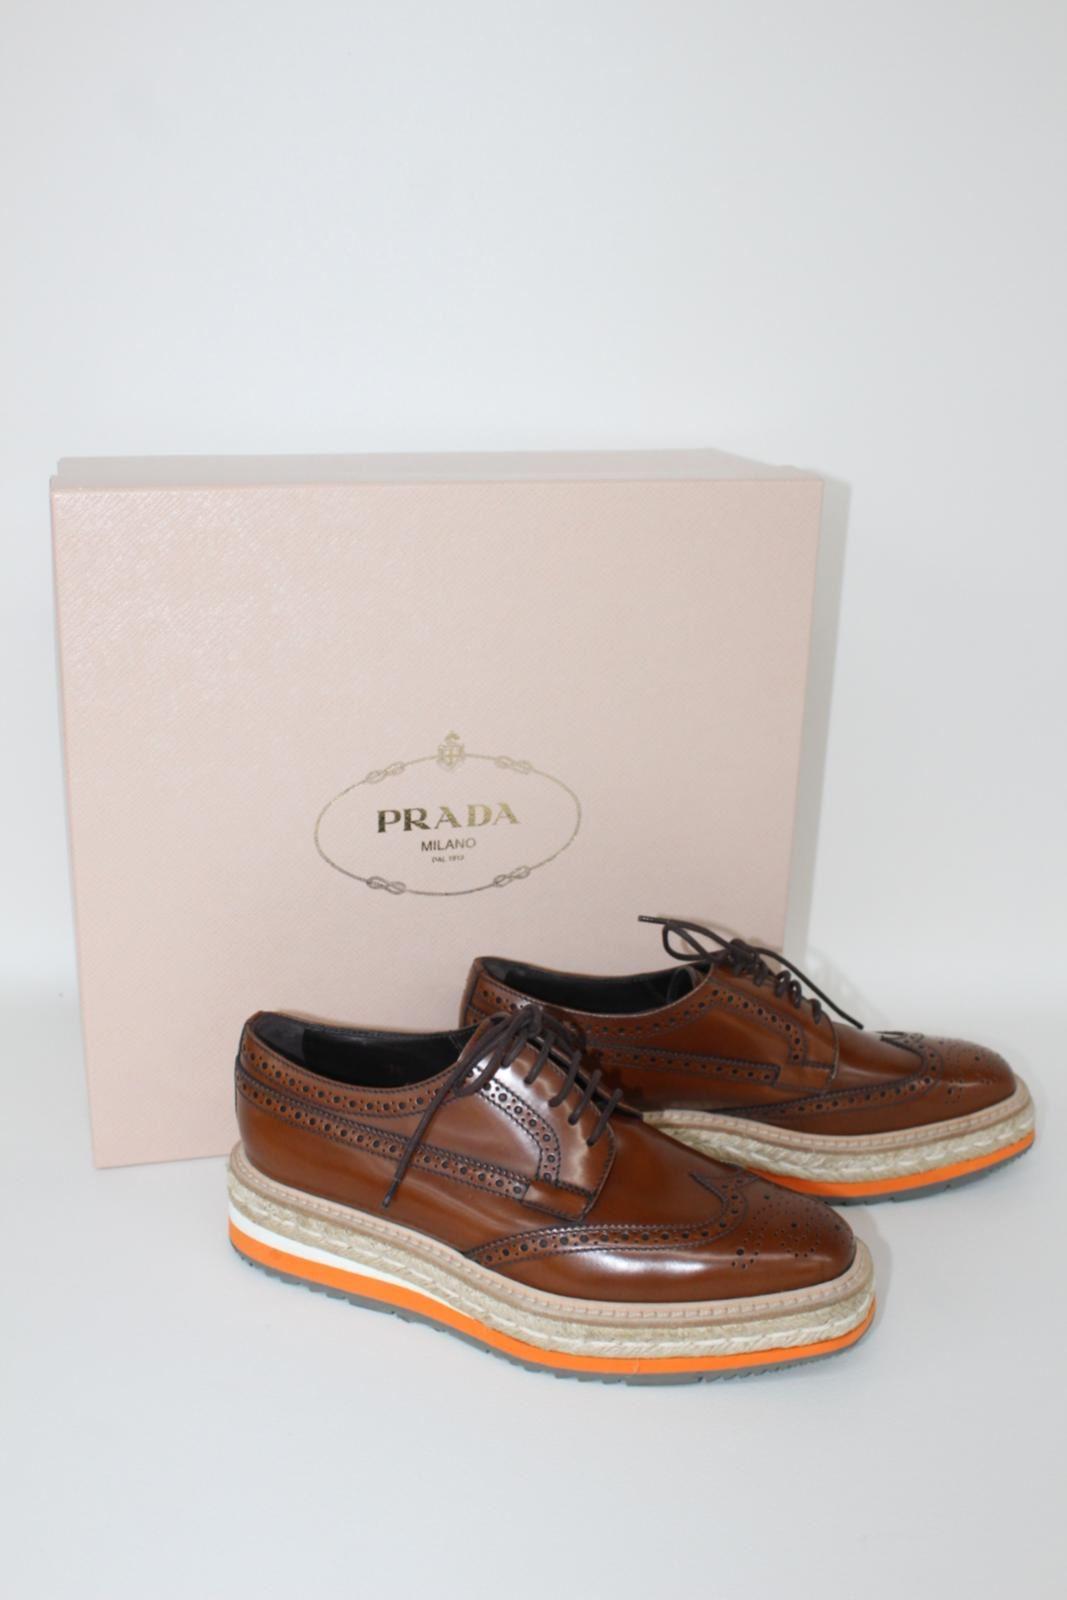 PRADA-Spazzolato-Leather-Brogue-Ladies-Tabaco-Brown-Leather-Shoes-UK3-EU36-BNIB